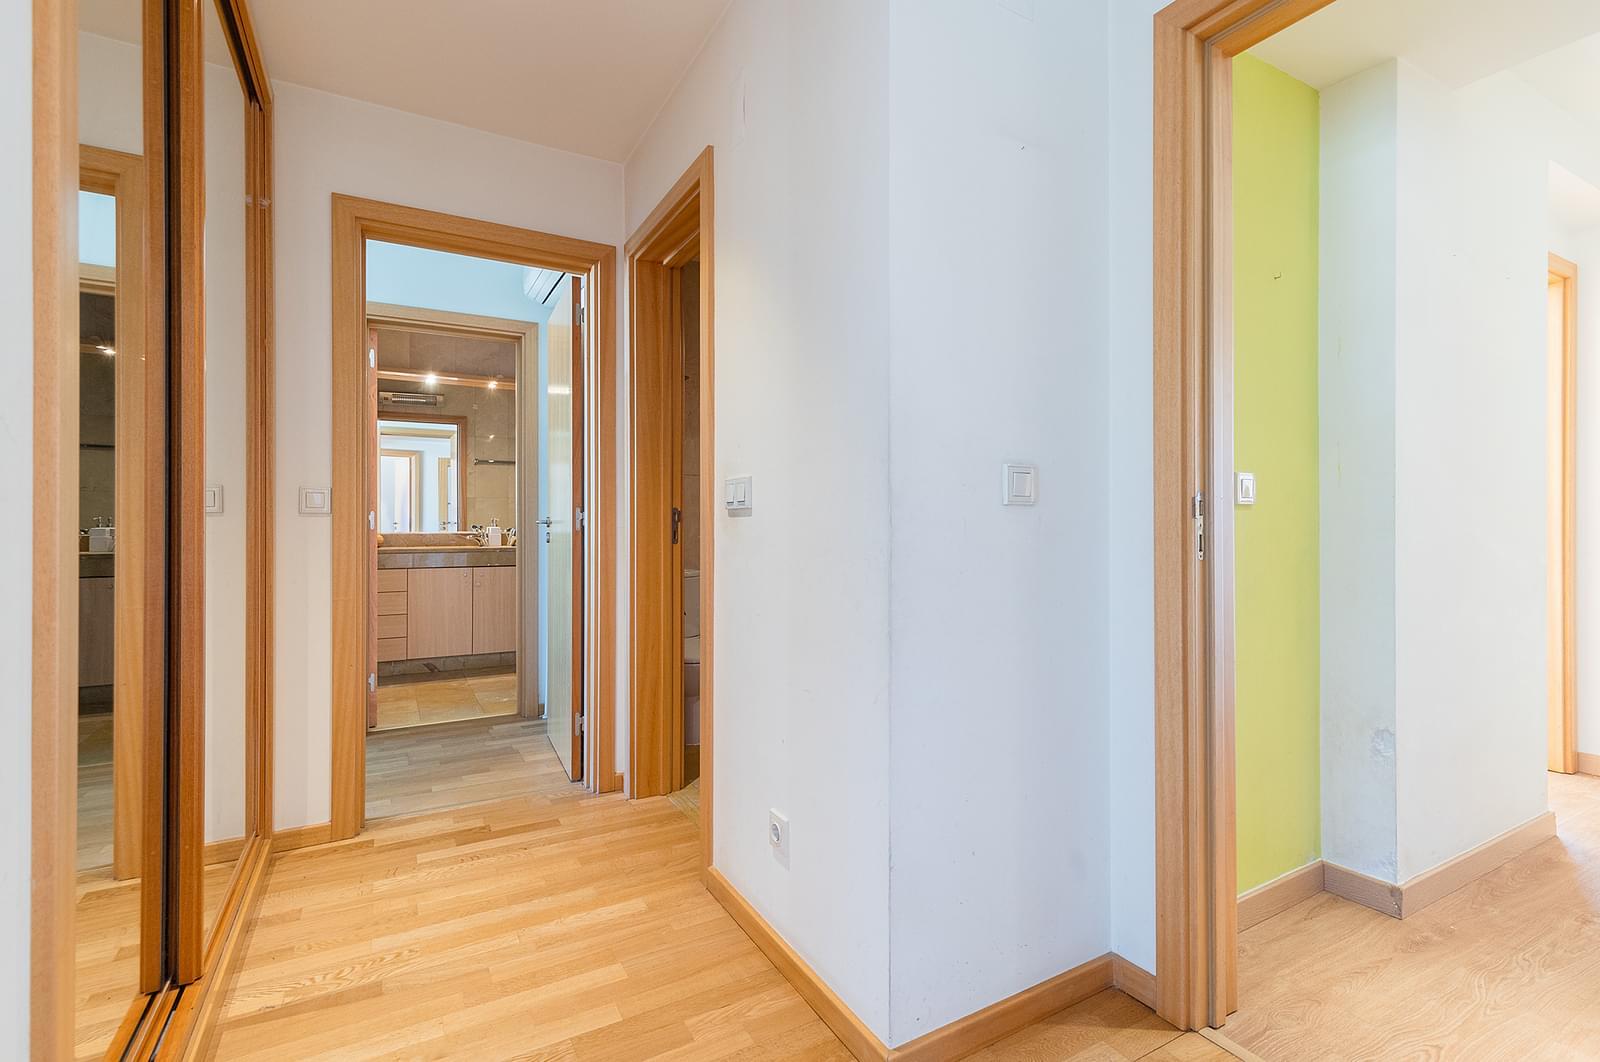 pf18953-apartamento-t3-lisboa-b00d9838-658e-42a8-b075-1facab07c711